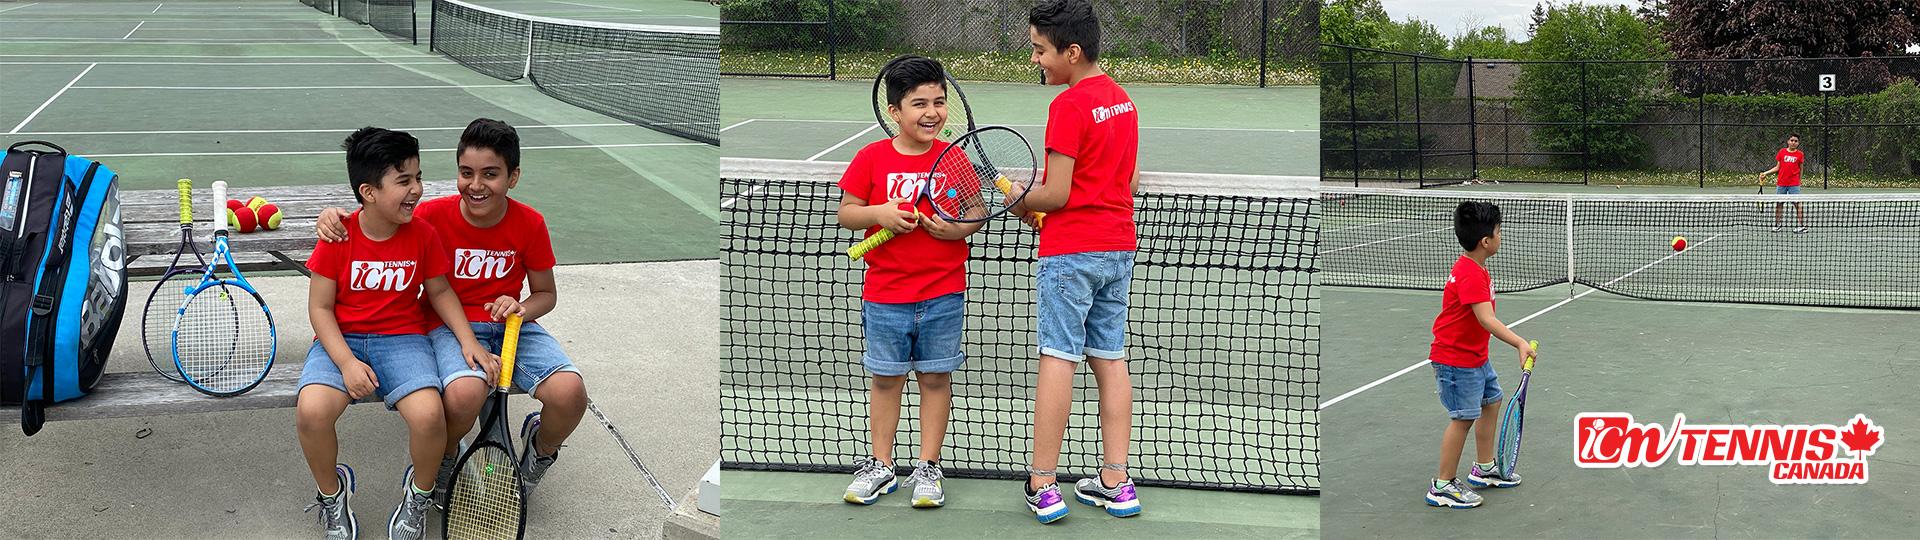 icmtennis - tennis lessons in Oshawa